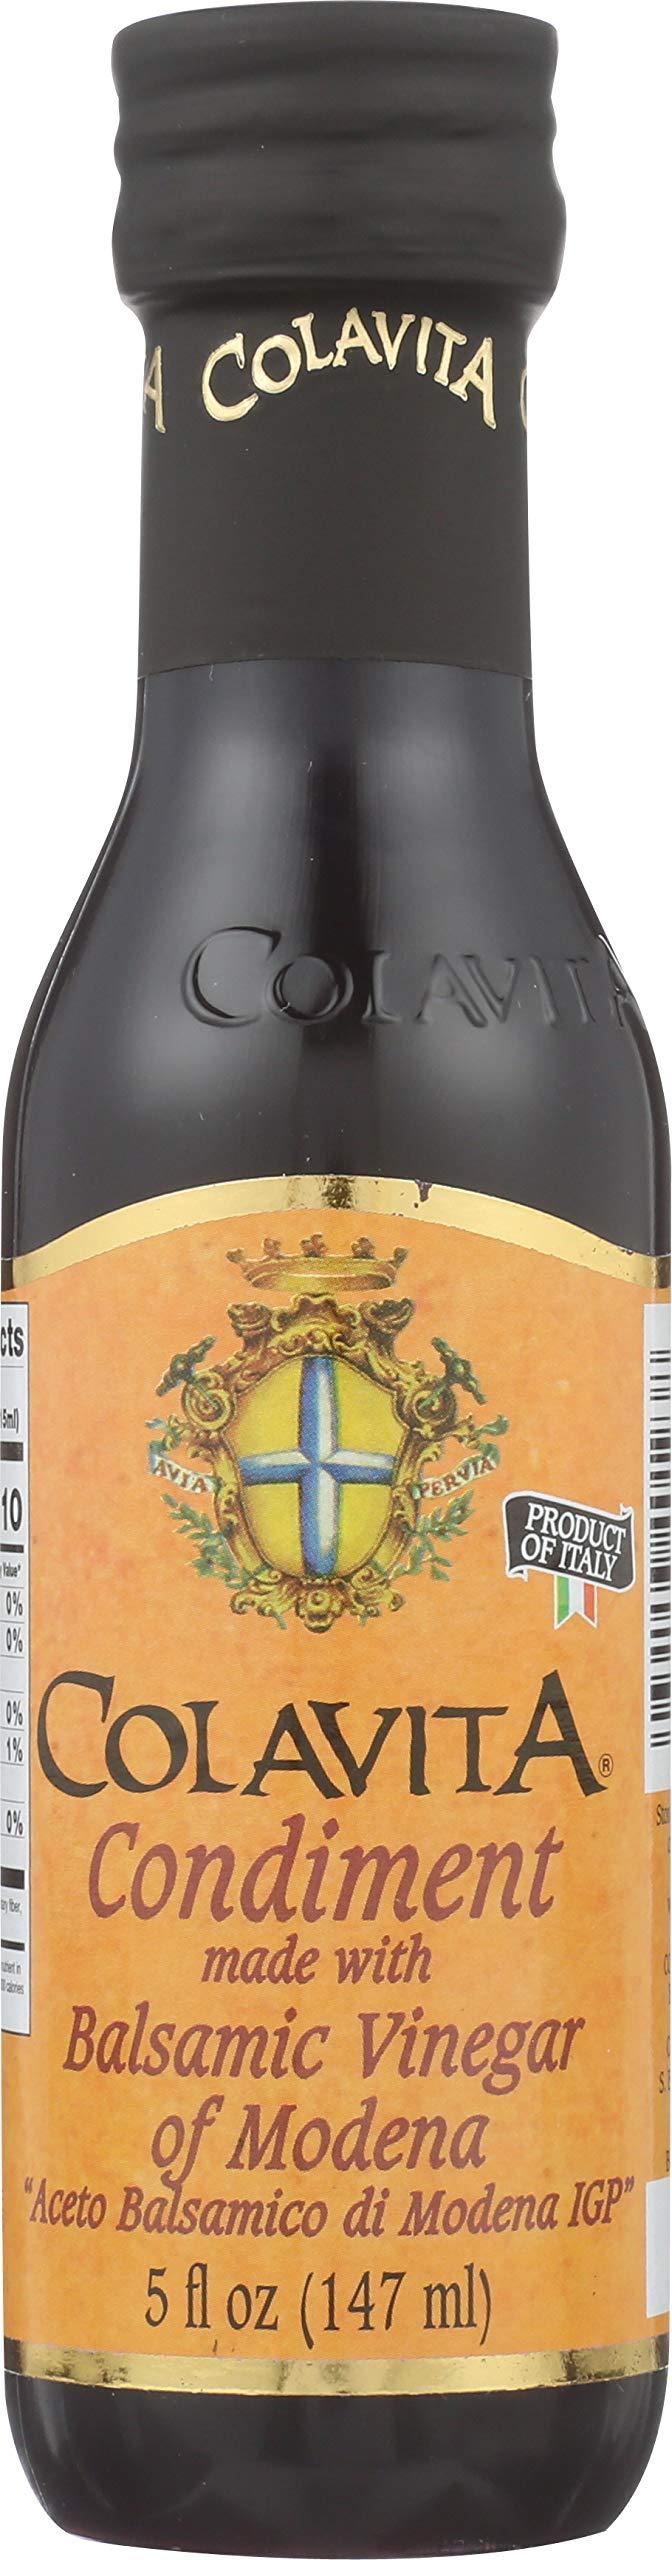 Colavita Balsamic Vinegar, 5-Ounce Bottles (Pack of 16) by Colavita